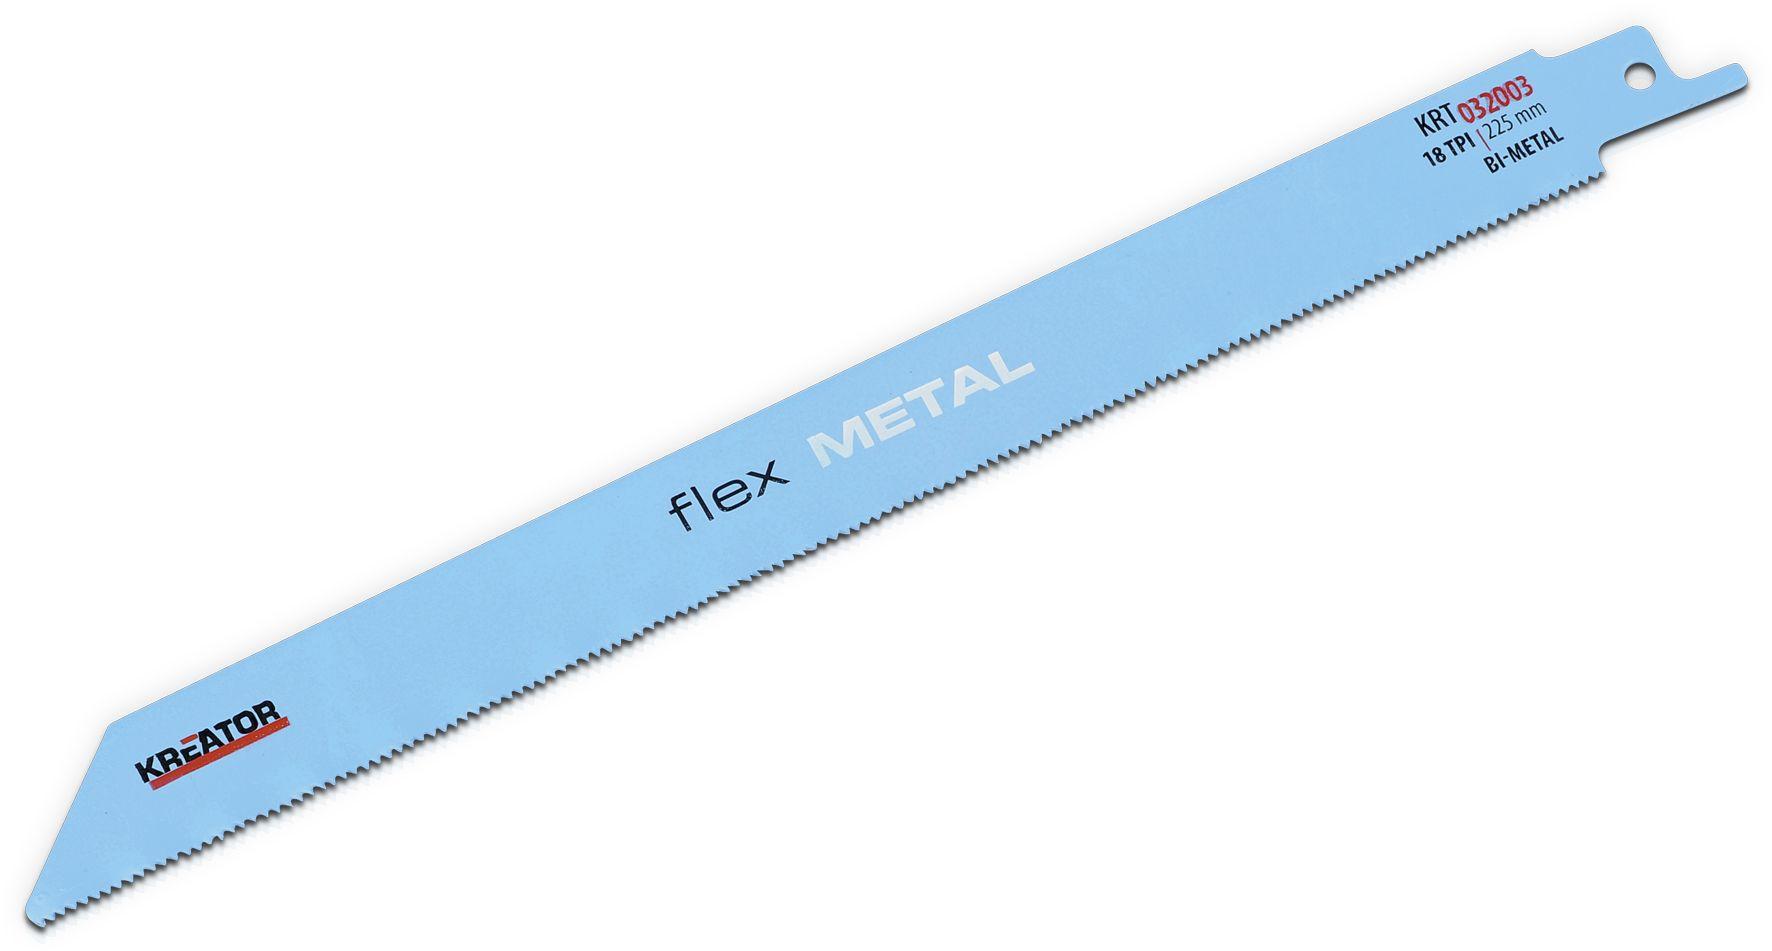 Kreator KRT032003 225mm Reciprozaagbladen   Zaagblad reciprozaag voor metaal